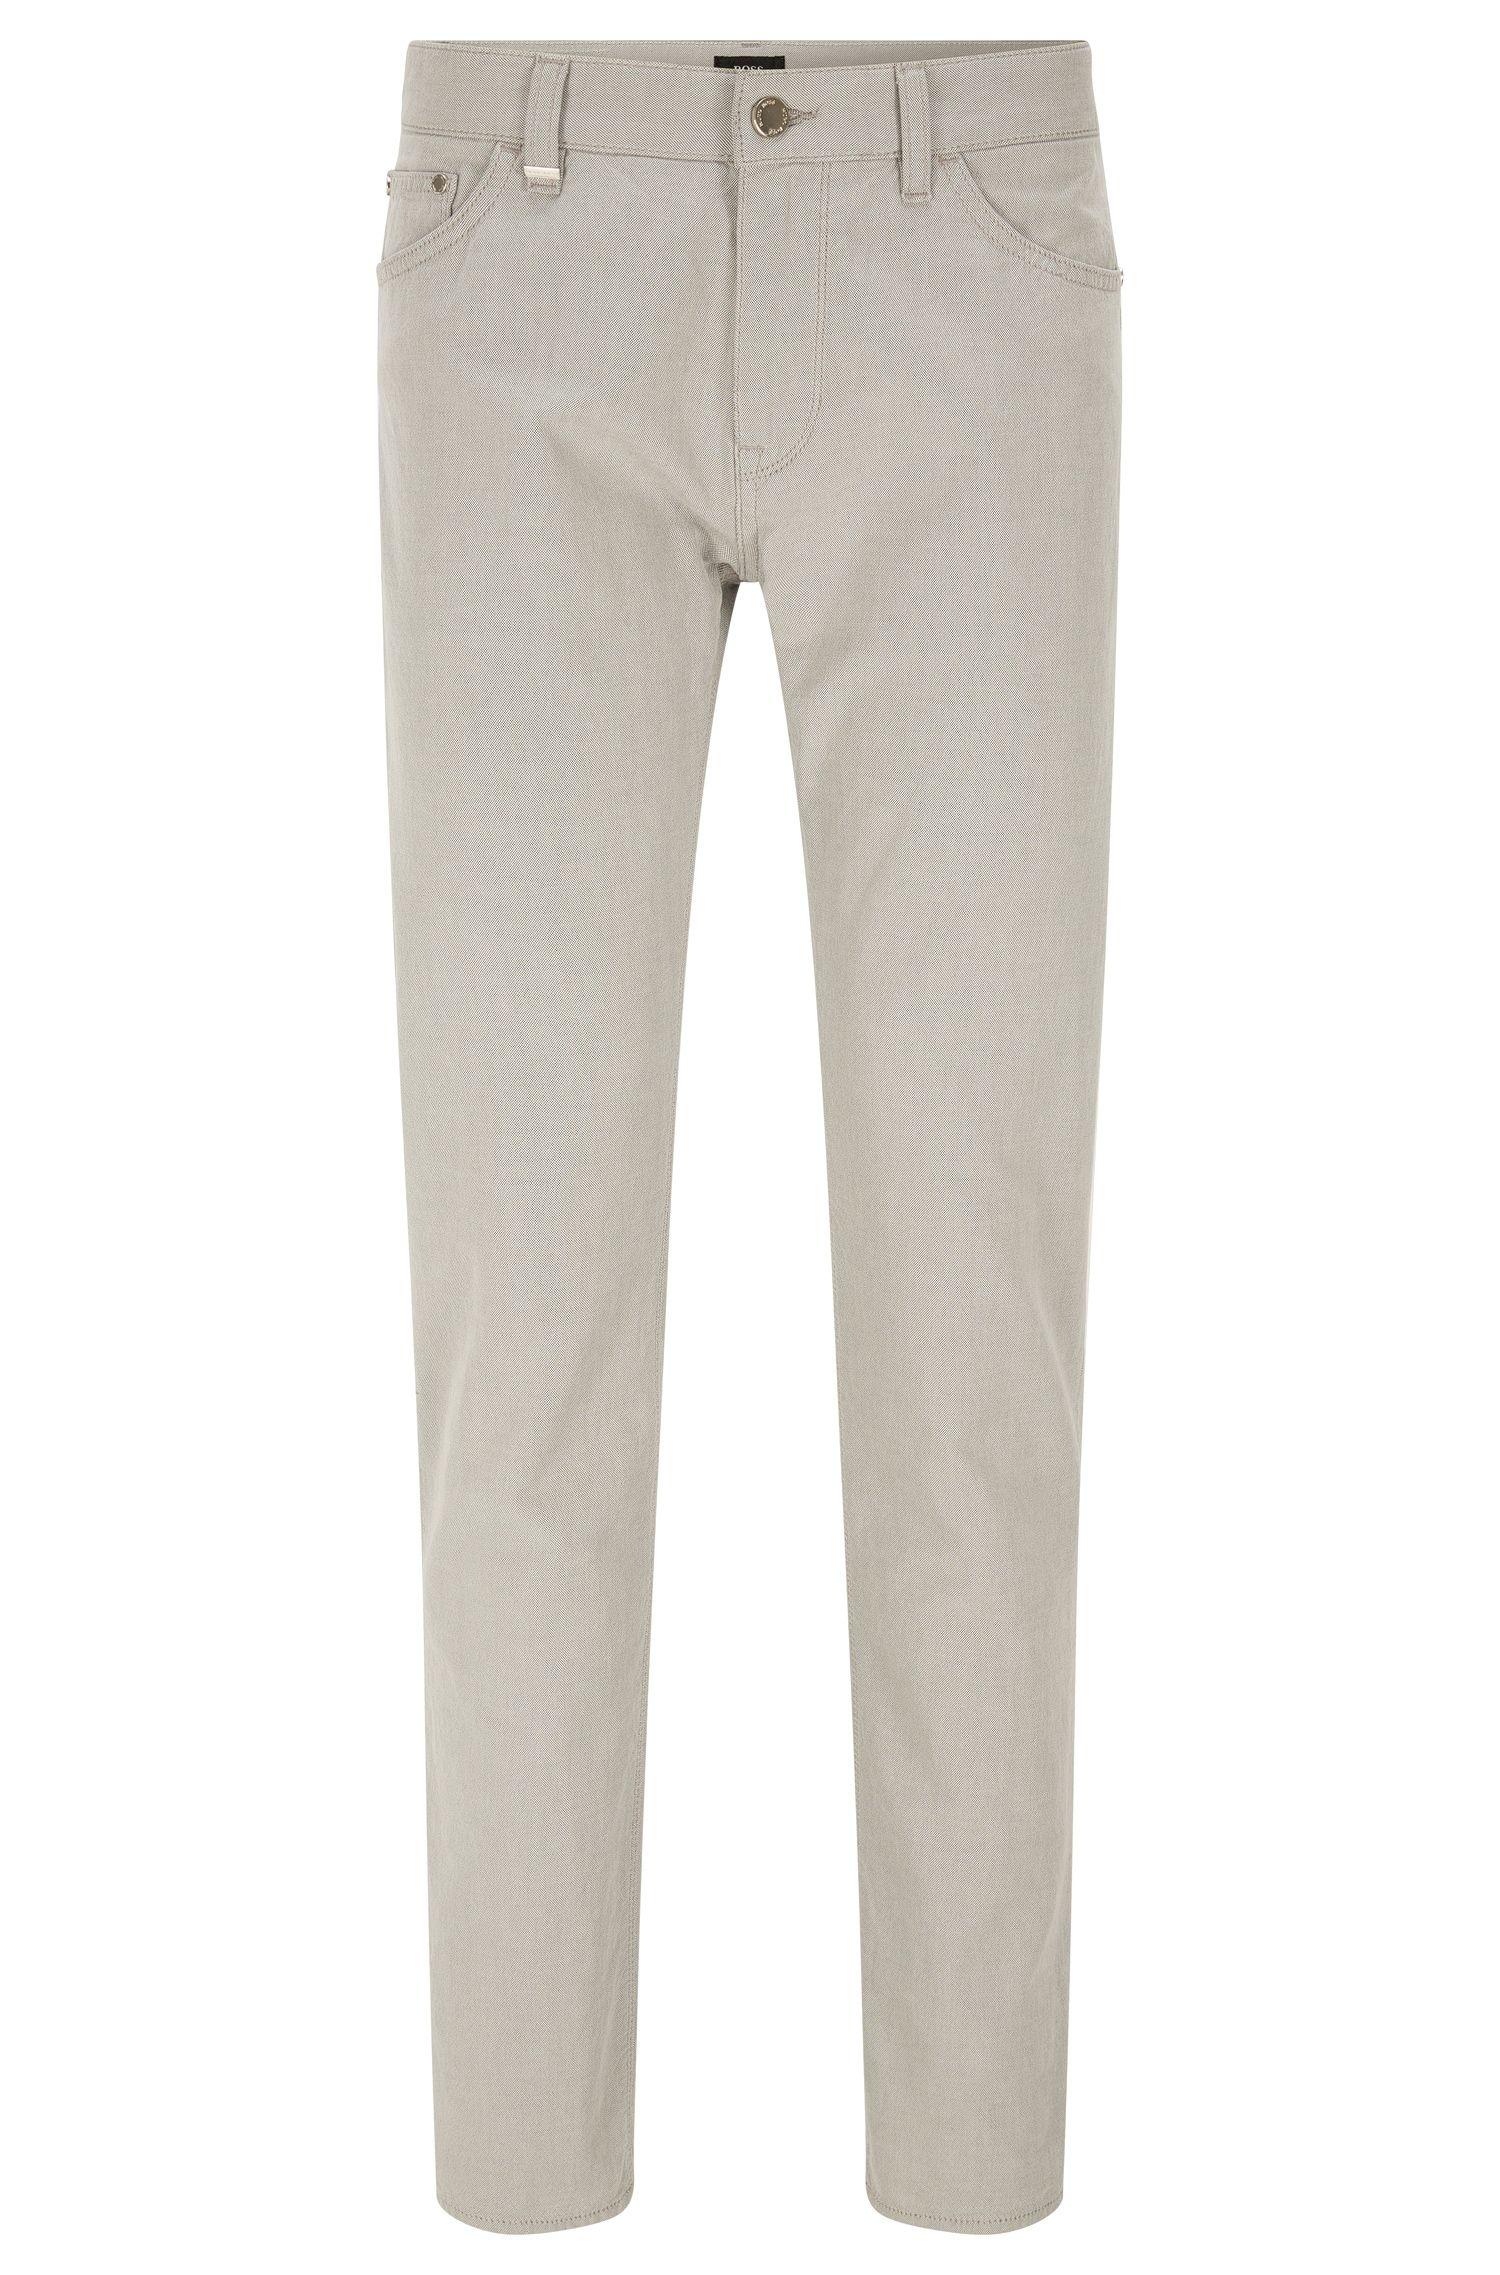 12 oz Italian Cotton Jeans, Regular Fit   Maine